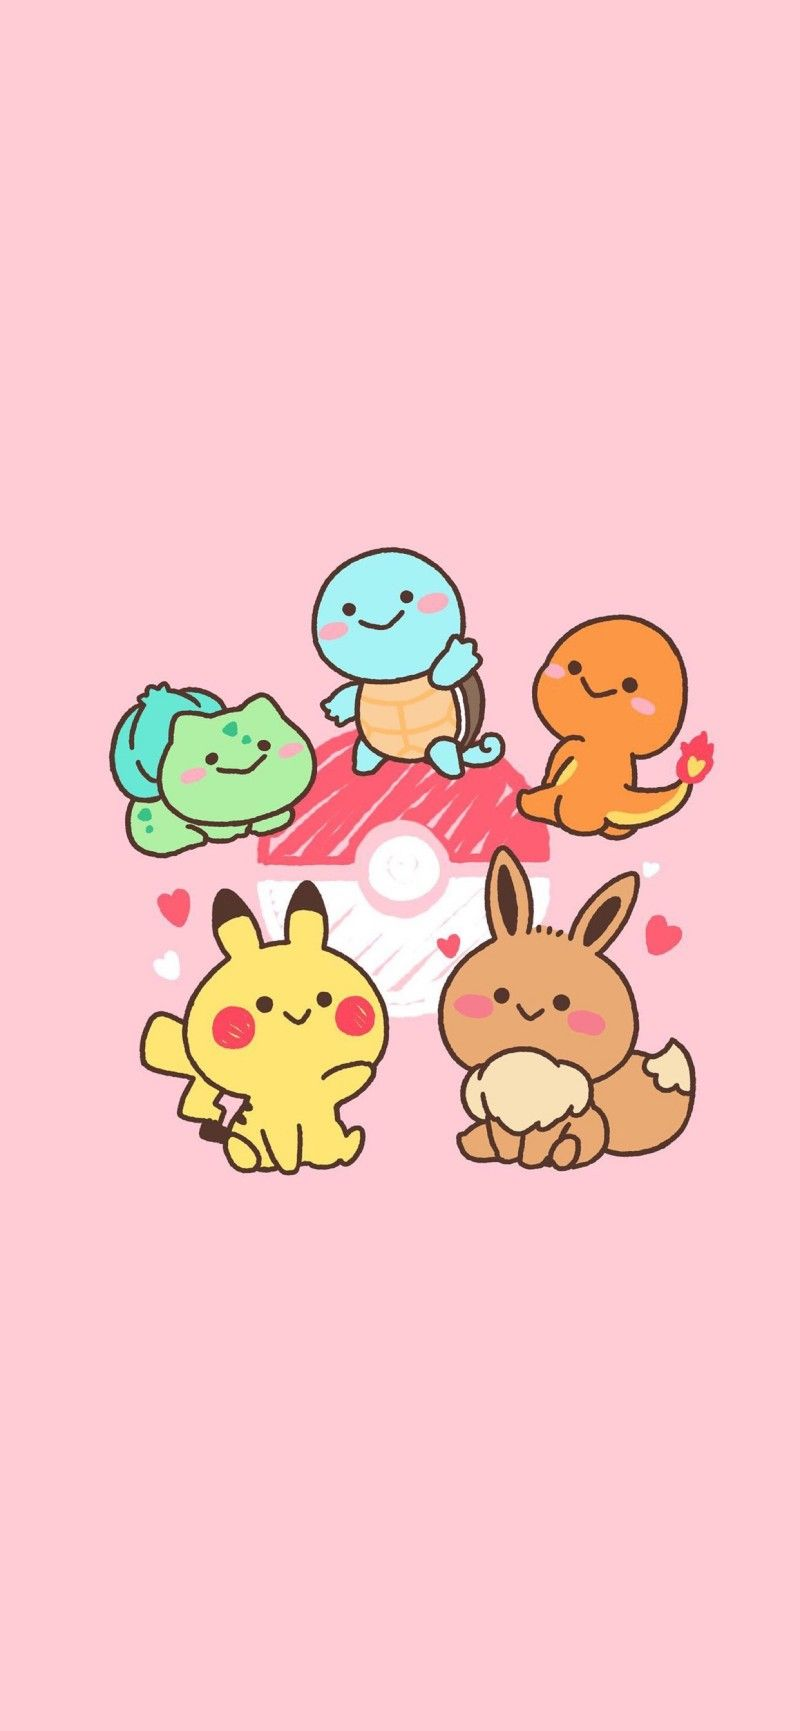 Save Follow Cute Pokemon Wallpaper Cute Pokemon Cute Pokemon Pictures